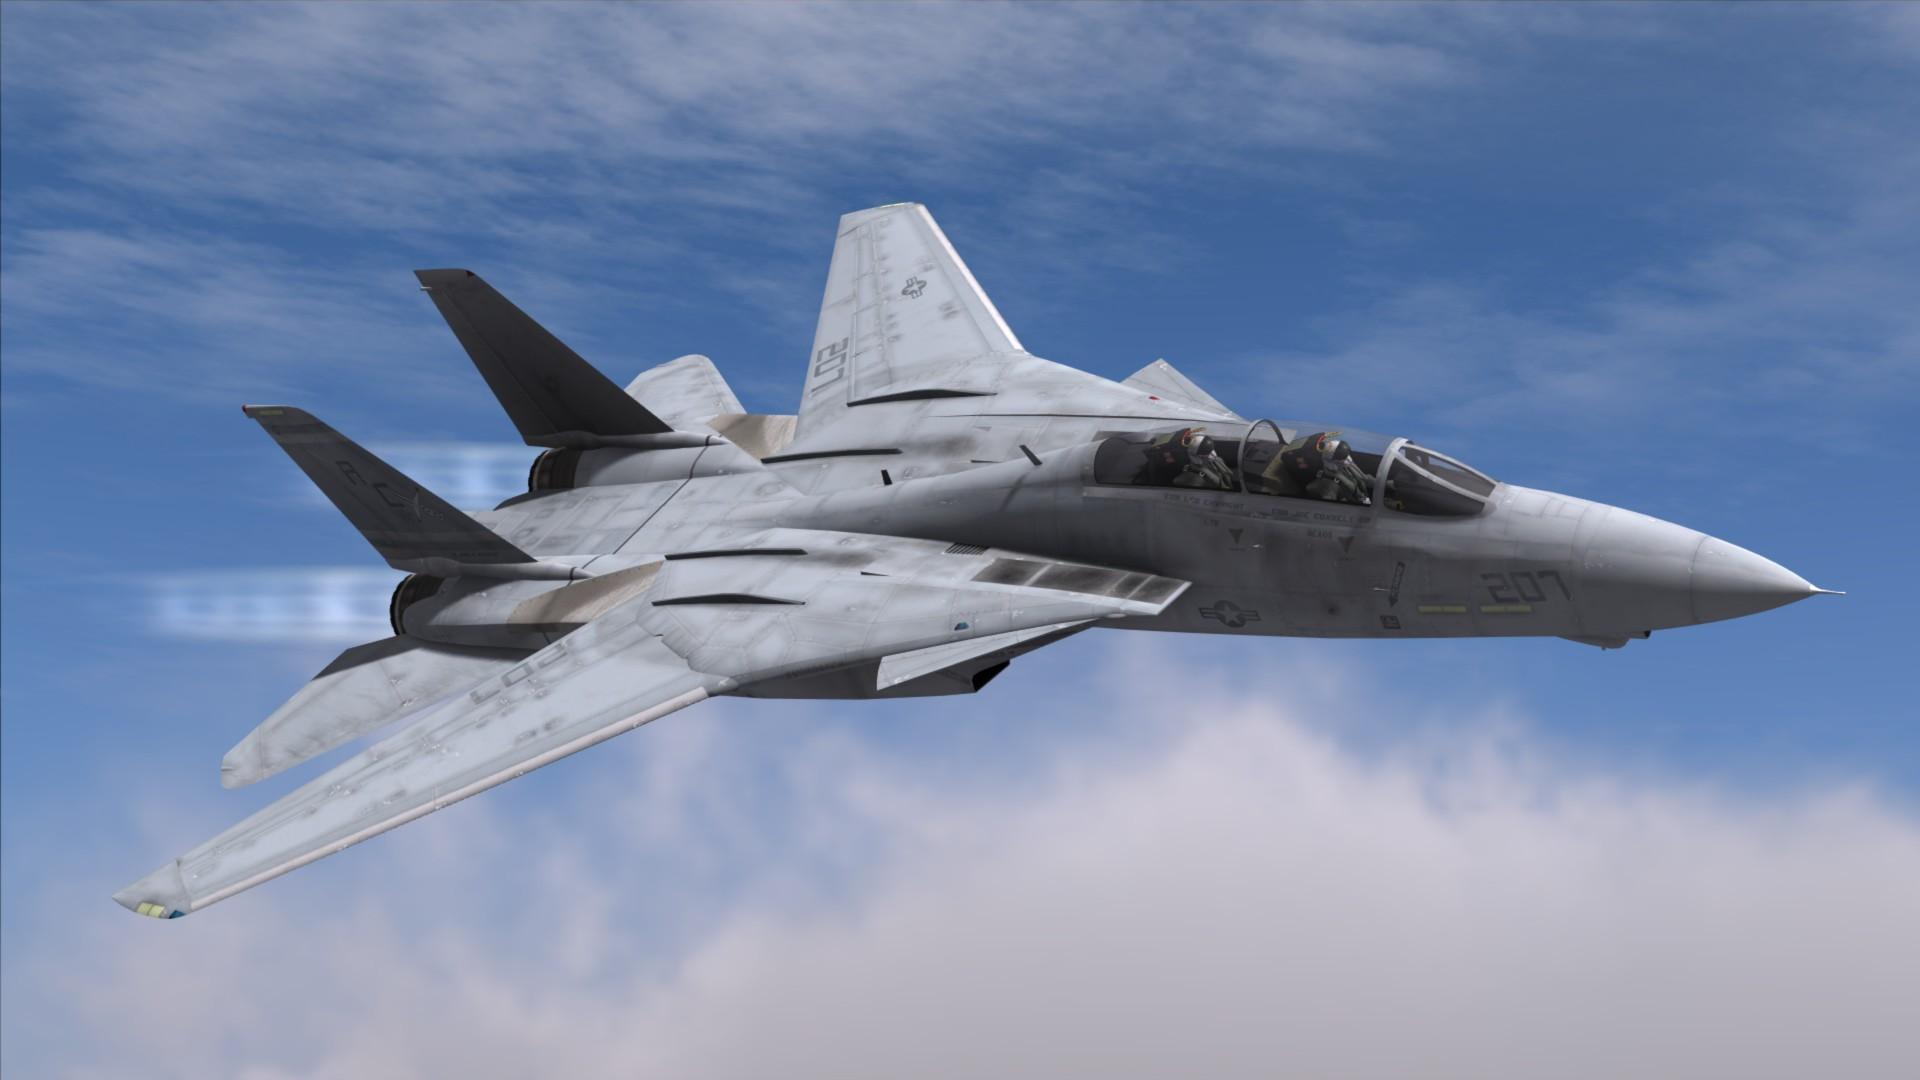 Res: 1920x1080, F-14 Tomcat - Jolly Rogers | Aircraft | Pinterest | Jolly roger .